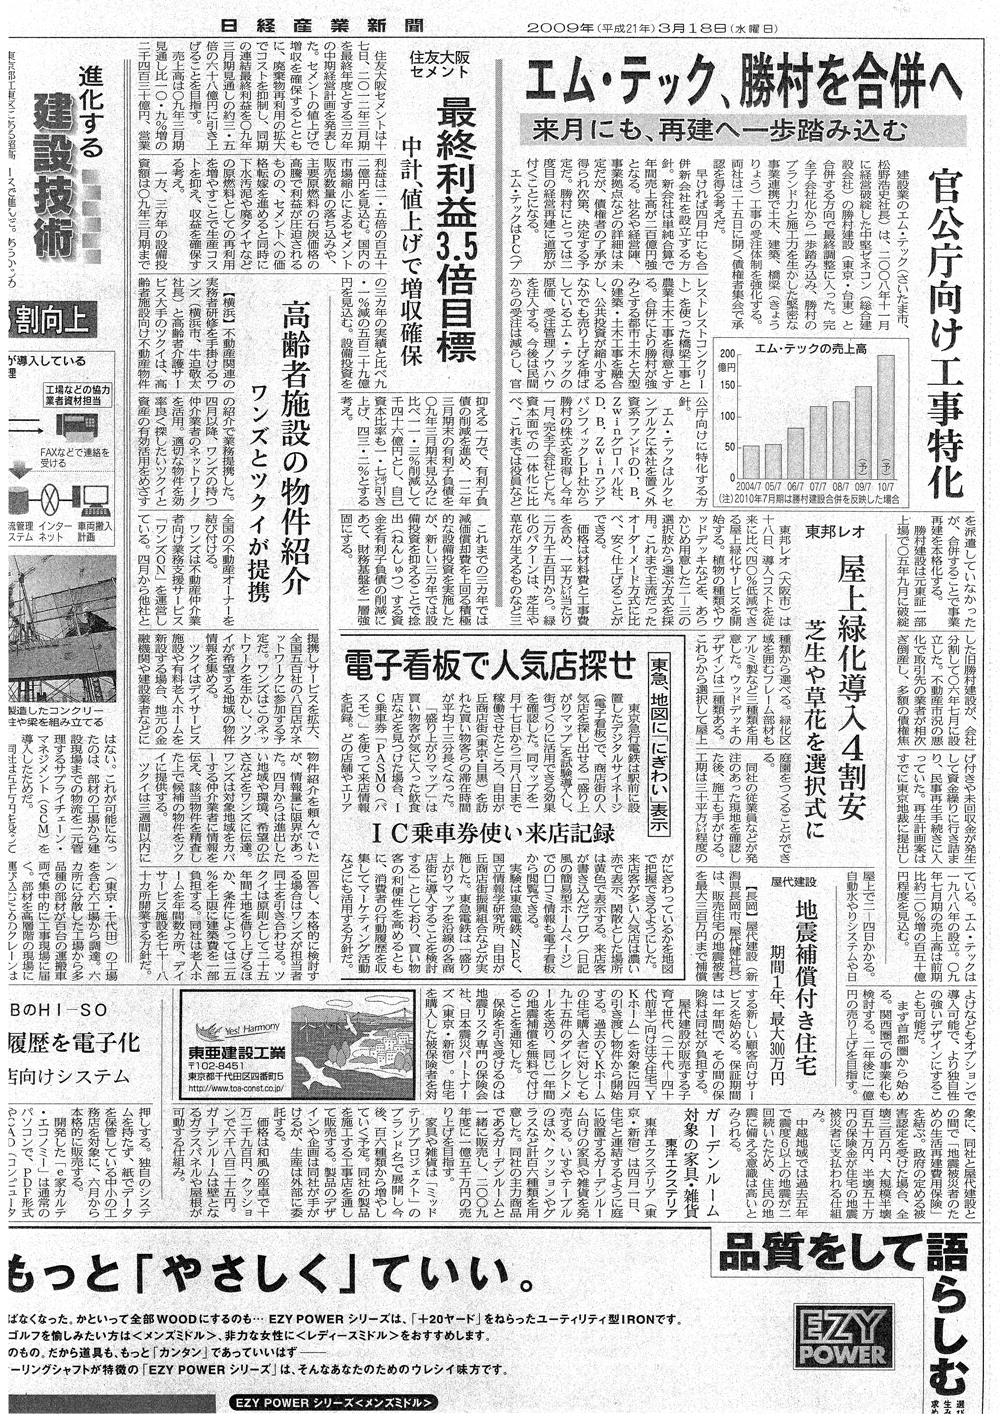 http://www.yashiro-kensetsu.co.jp/20090318_2_l.jpg